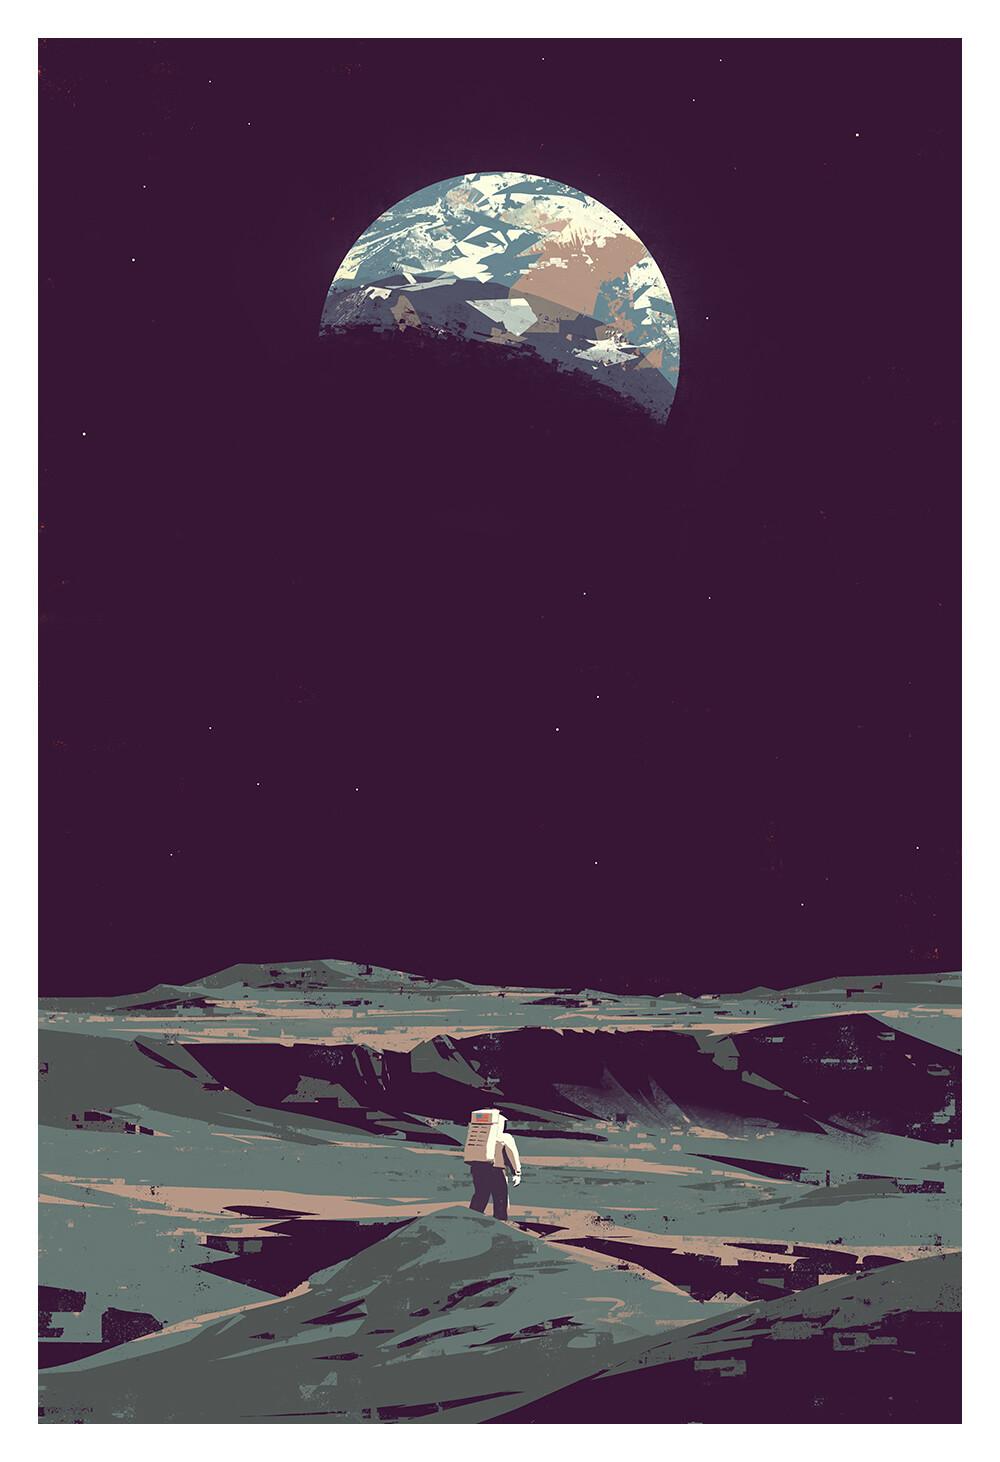 Mike mccain luna